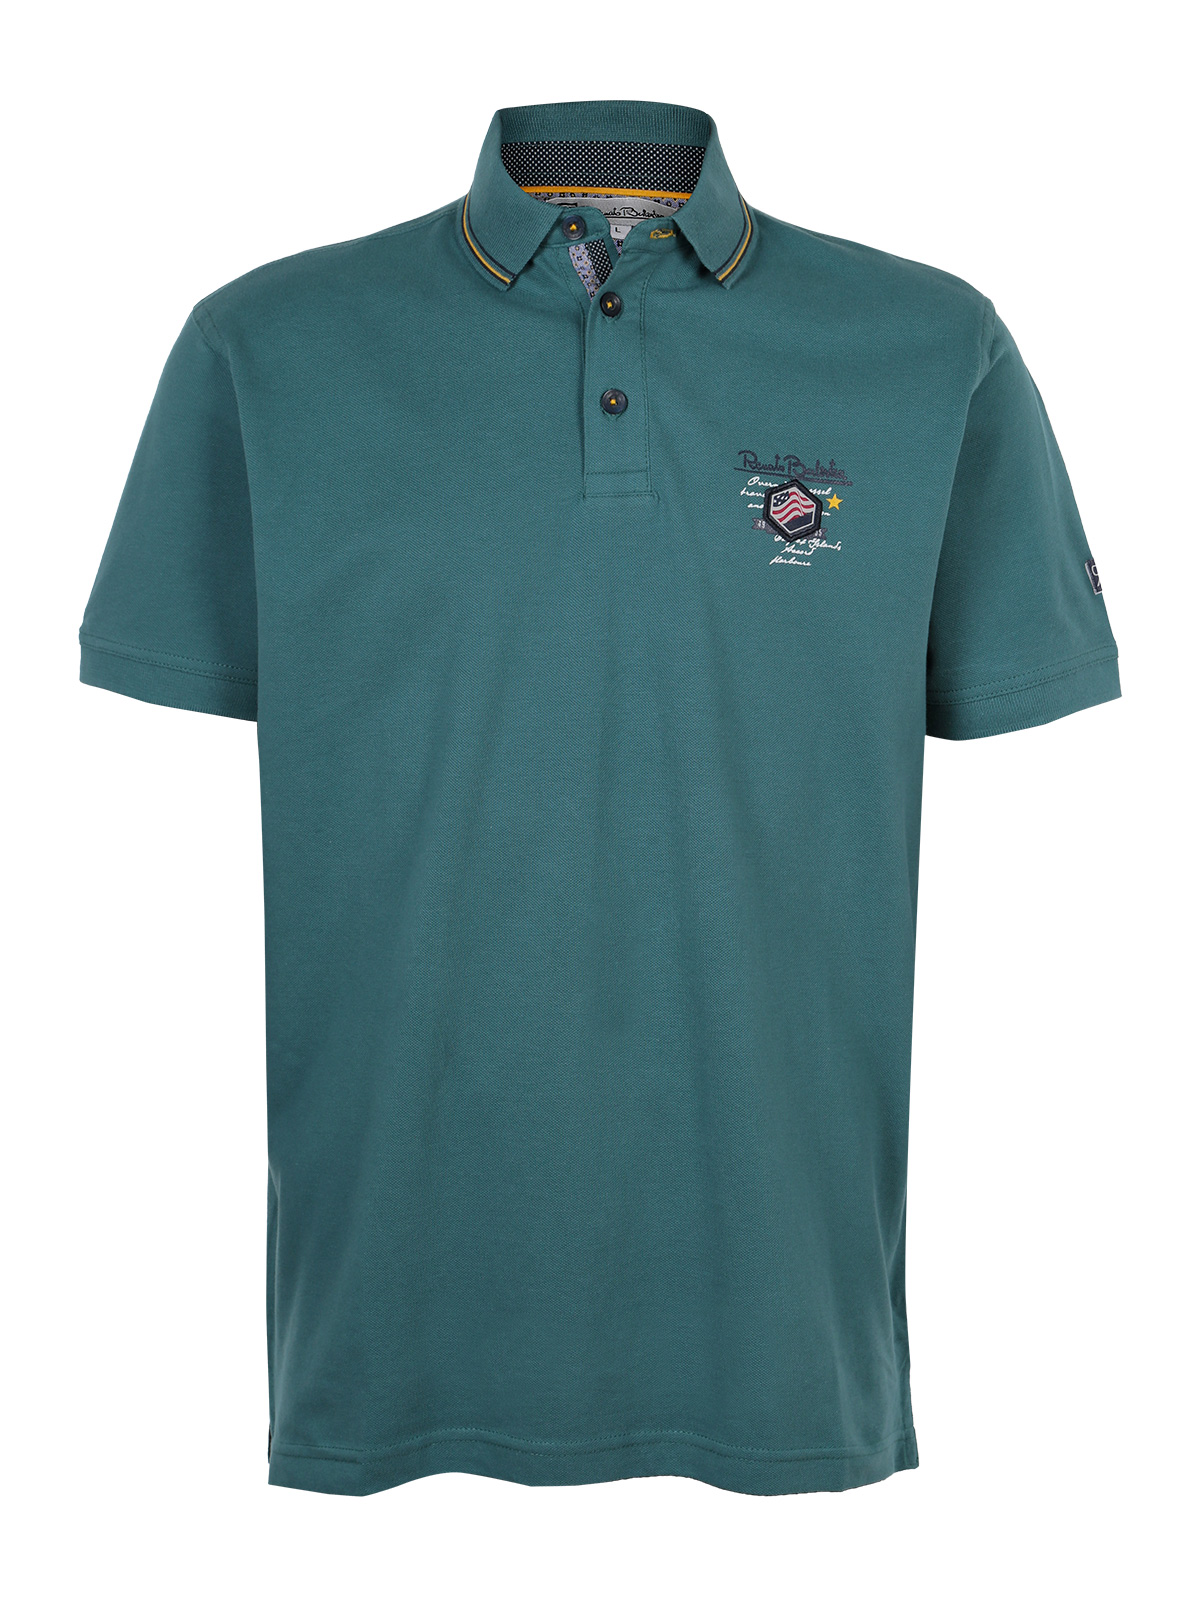 Polo   shirt cotton short-sleeved green